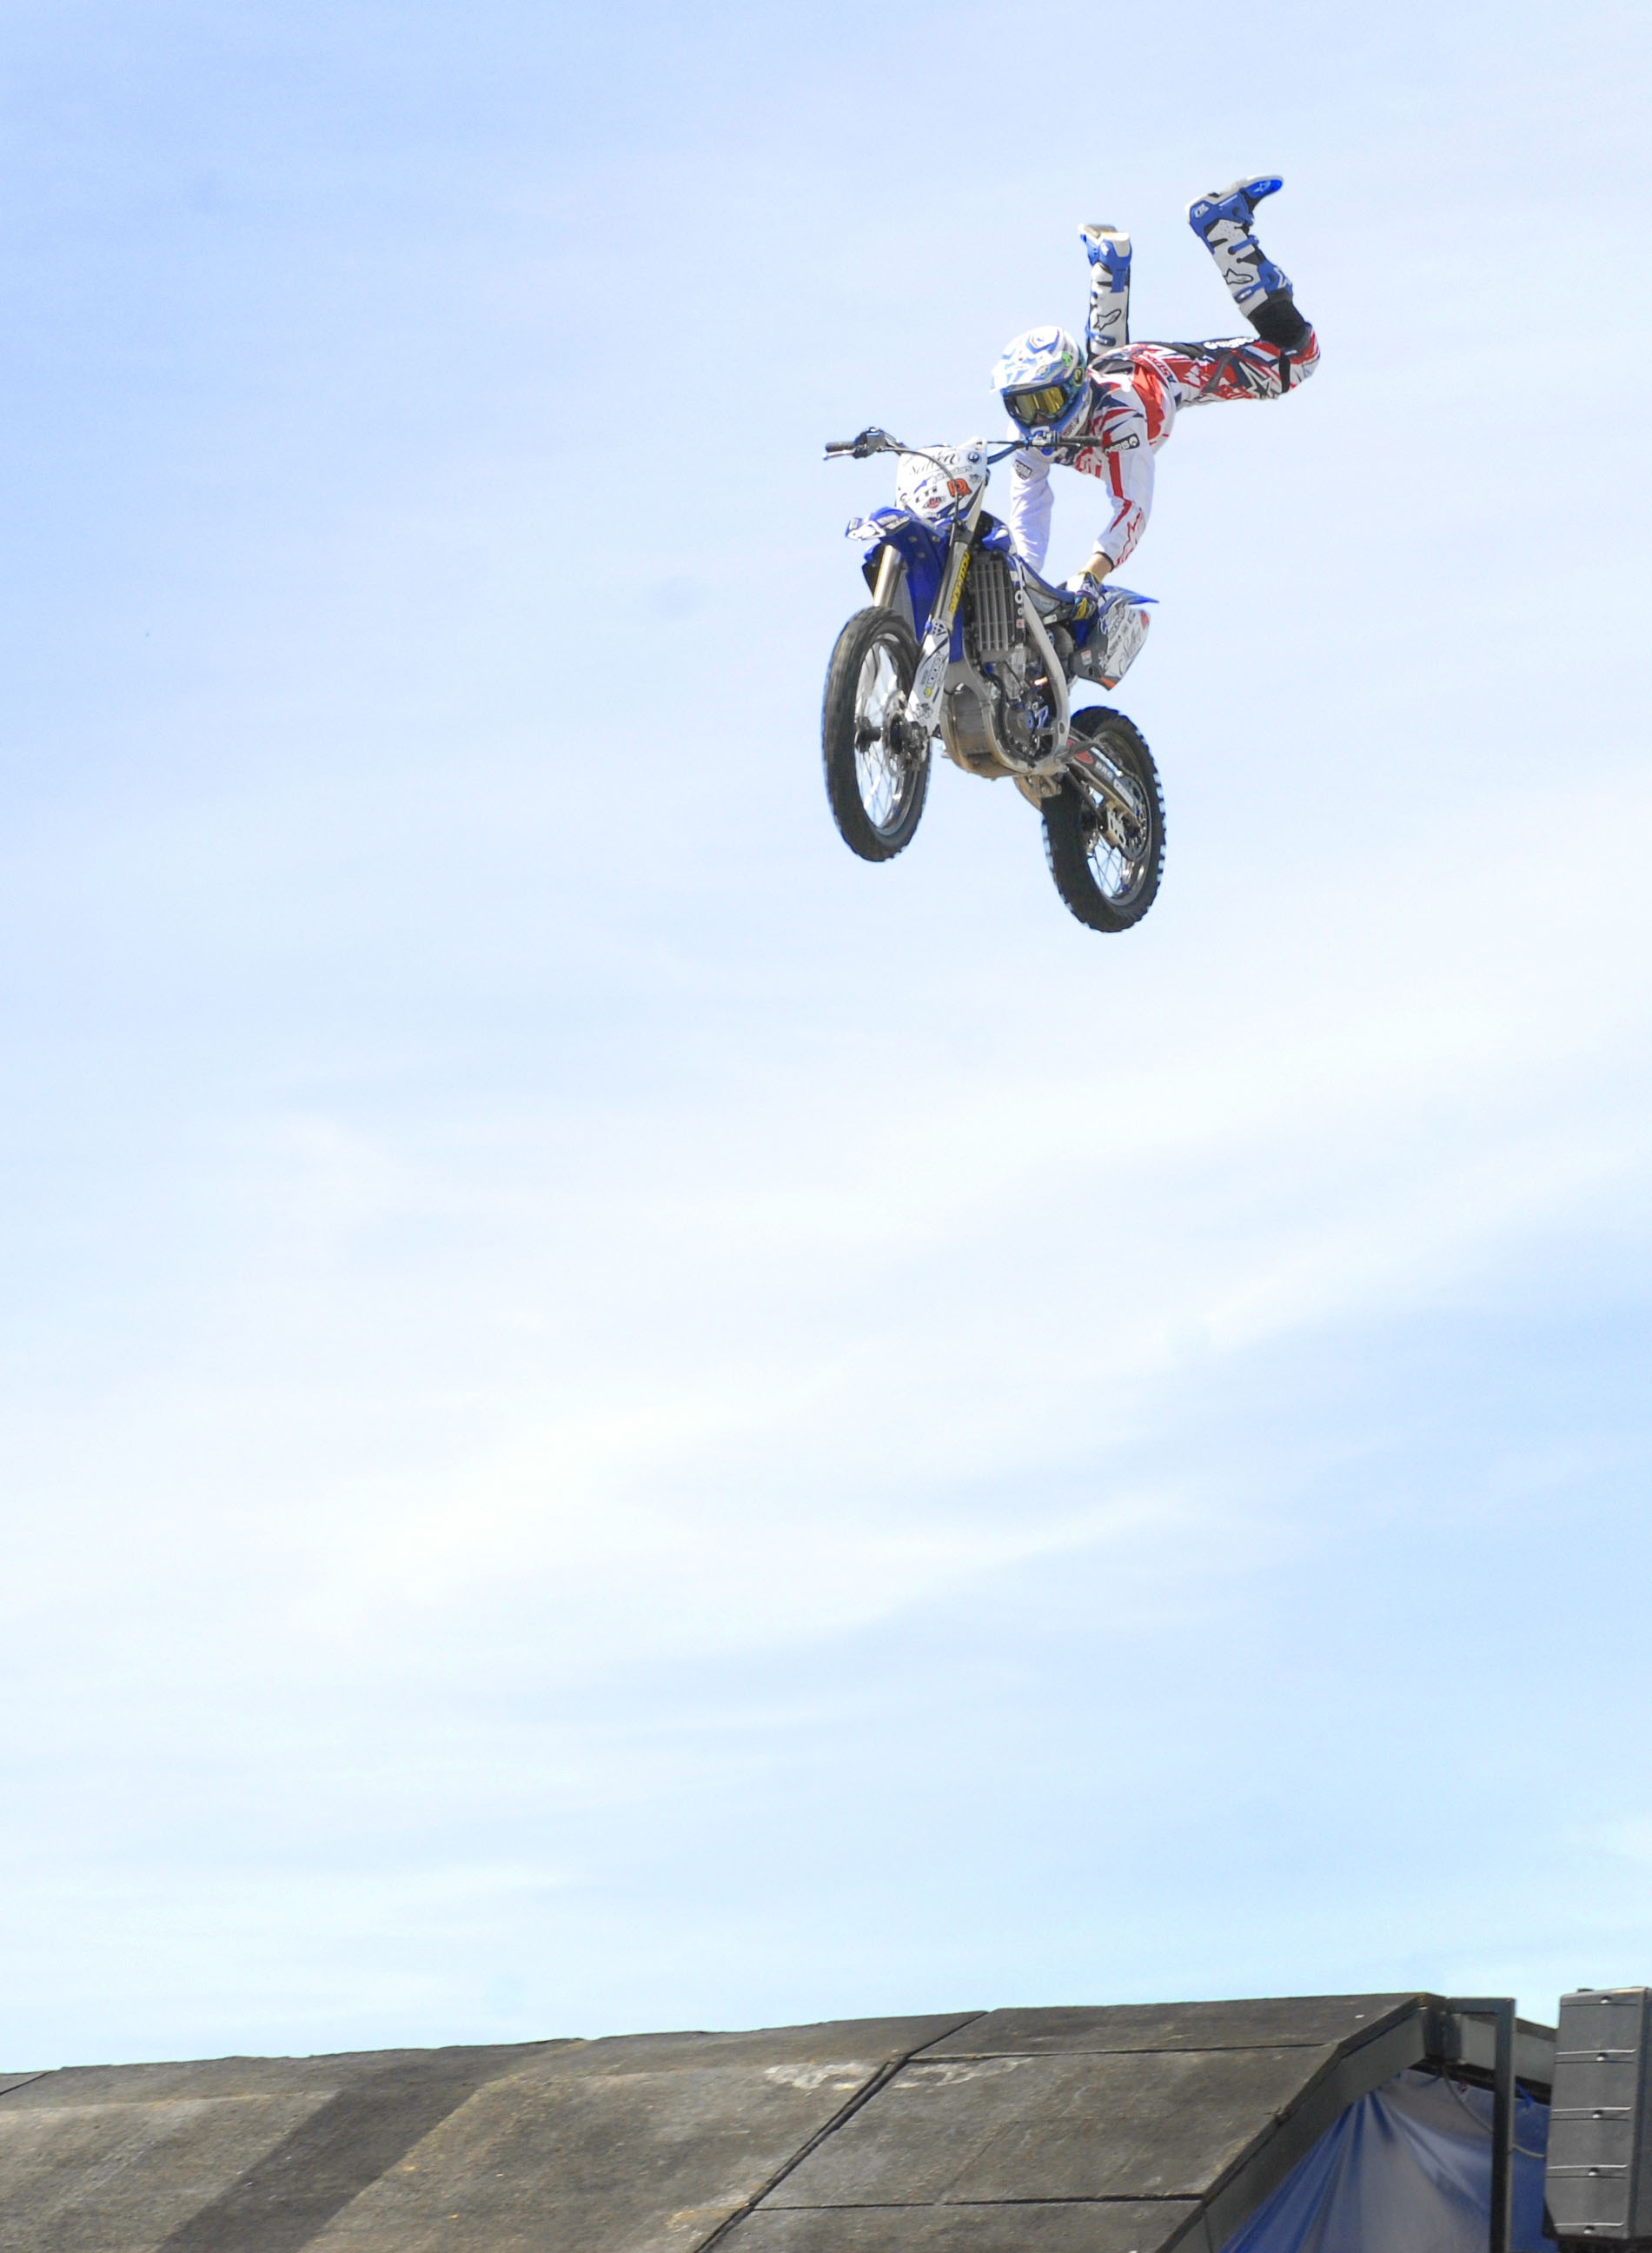 Bike jump photo